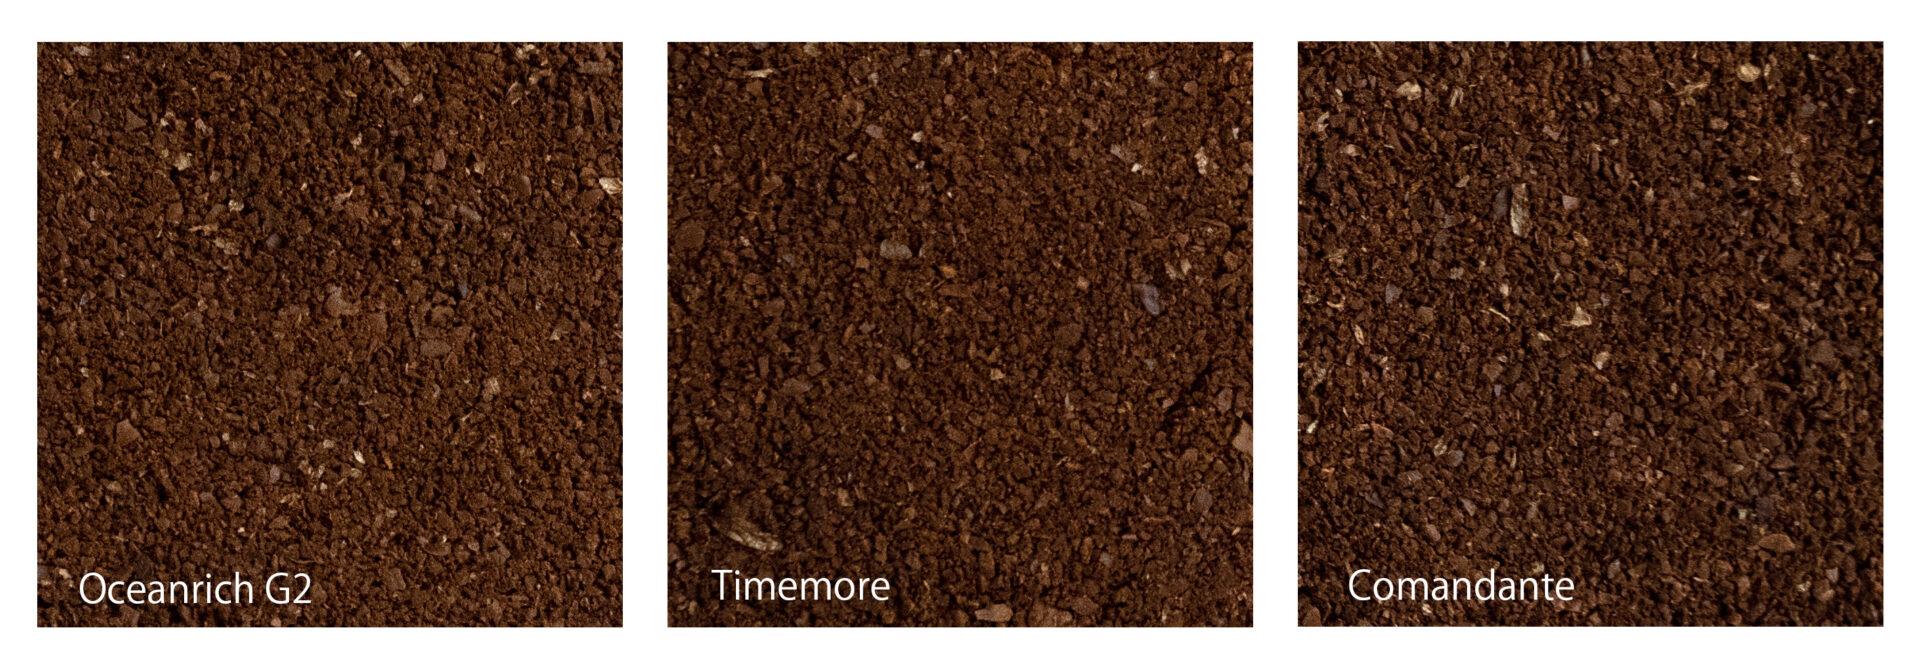 Timemore コマンダンテ oceanrich 挽き具合の比較